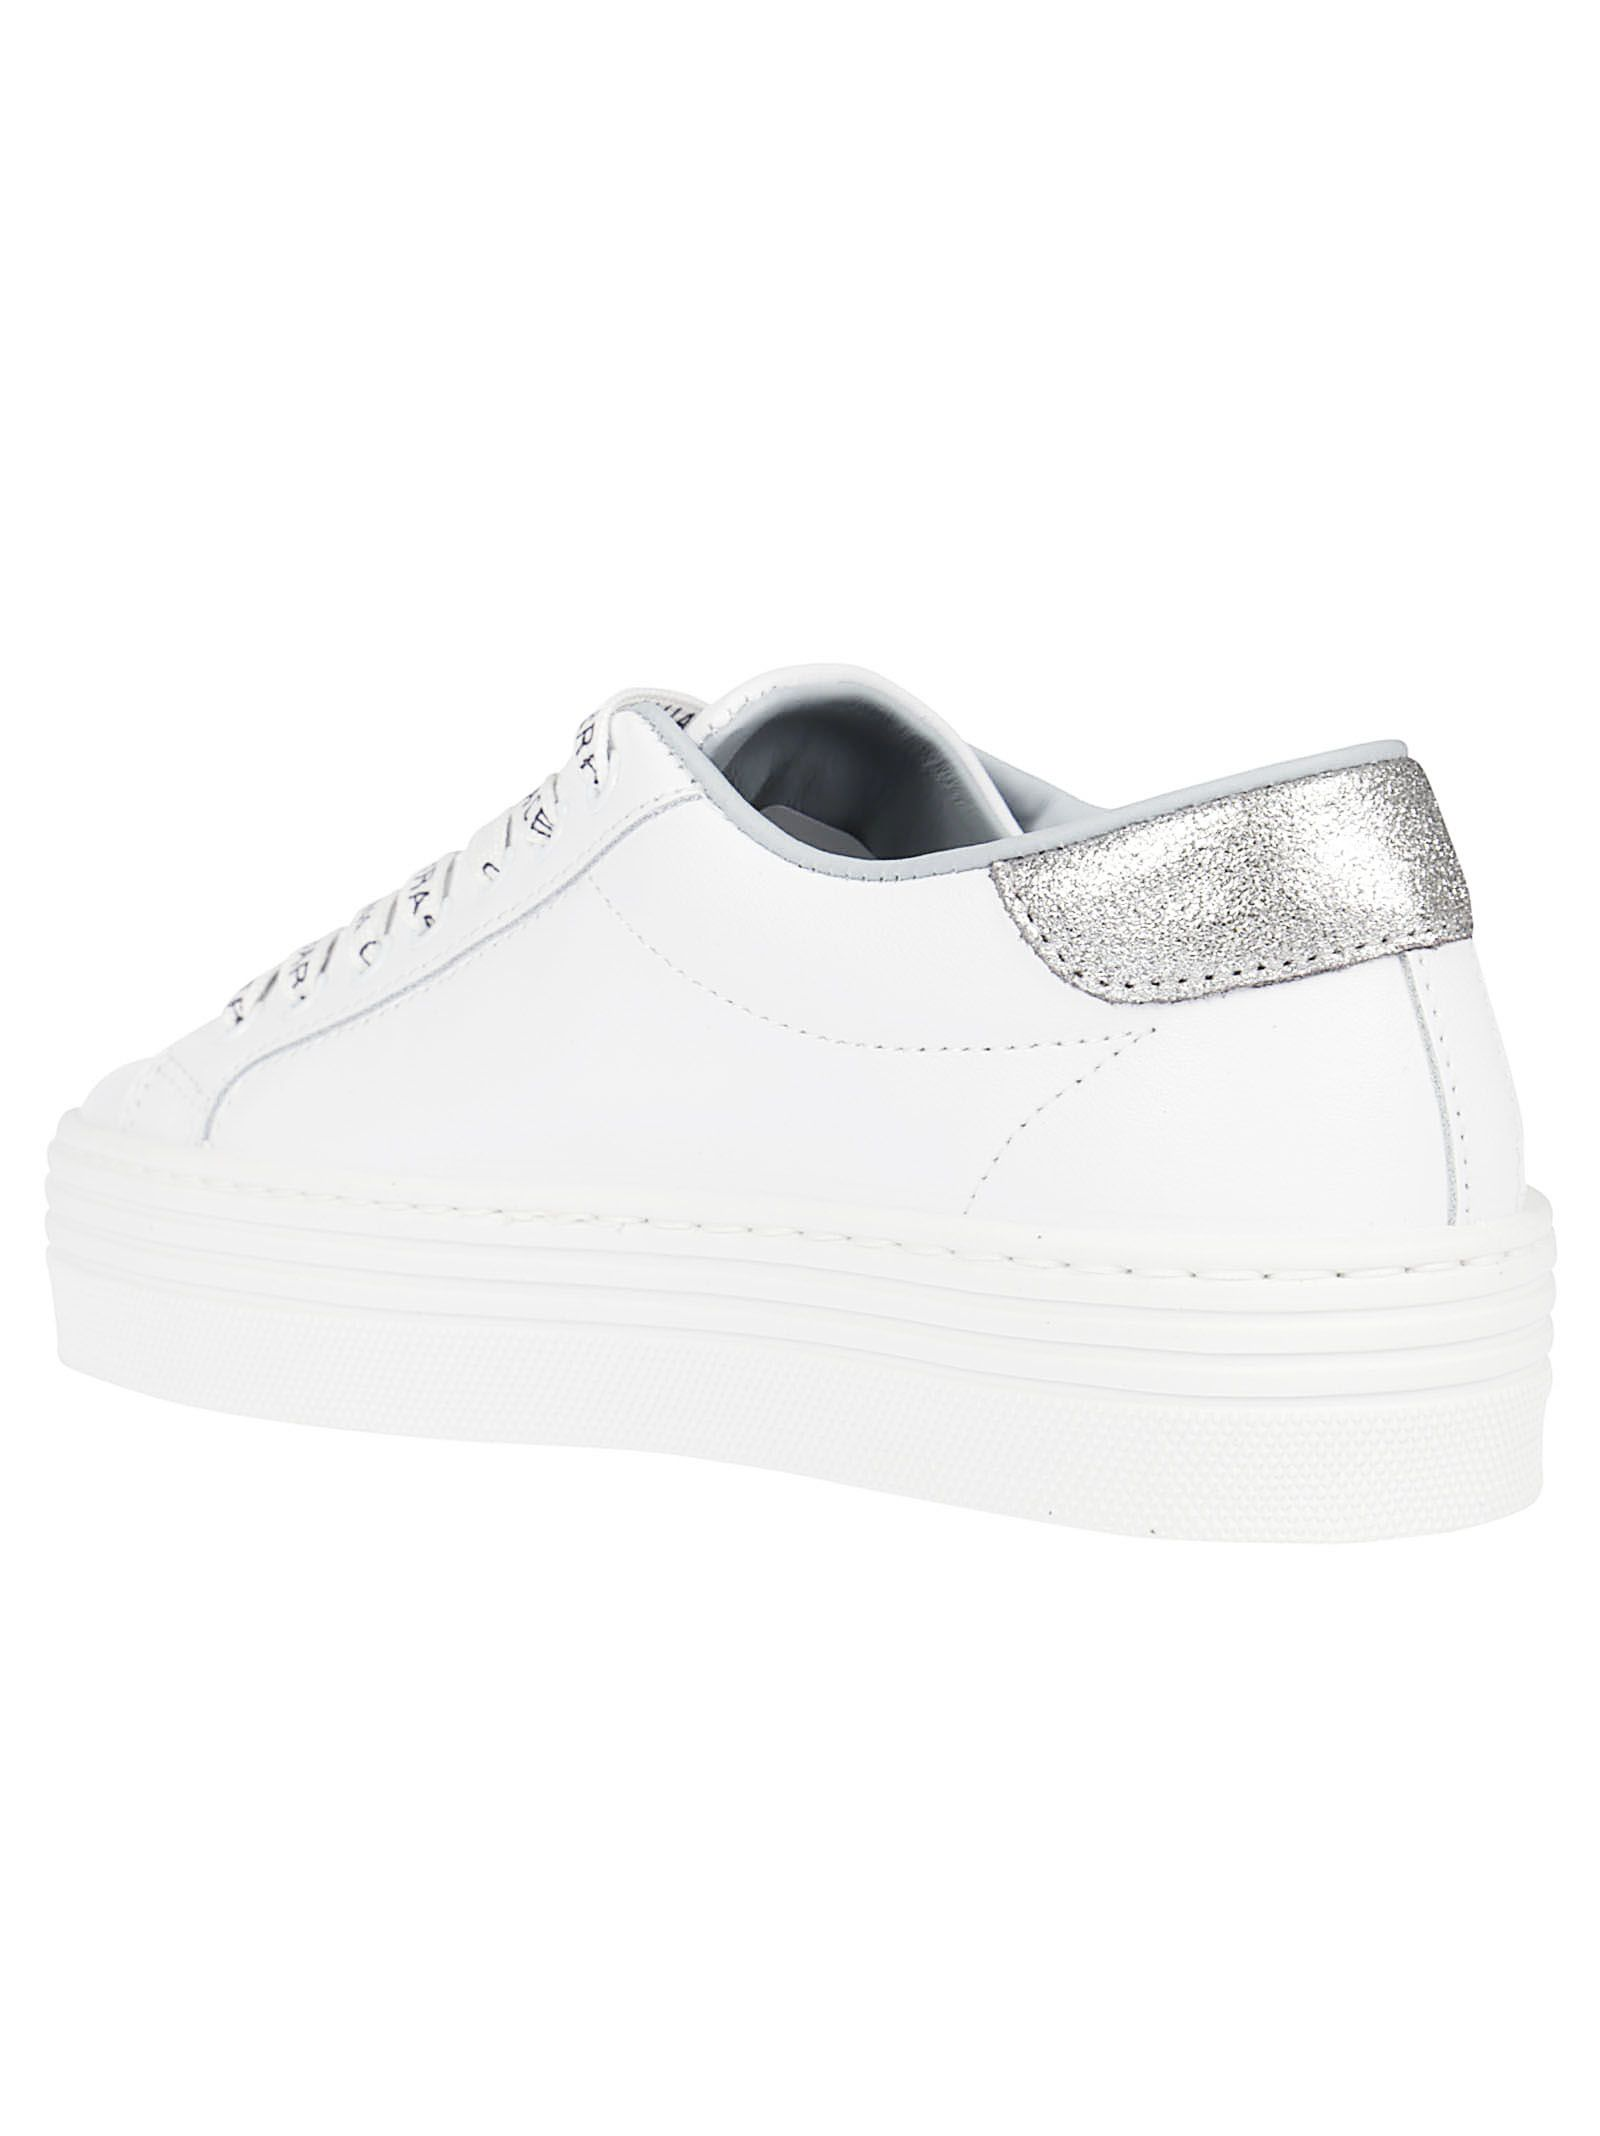 Chiara Suite sneakers - White Chiara Ferragni Qcglzt